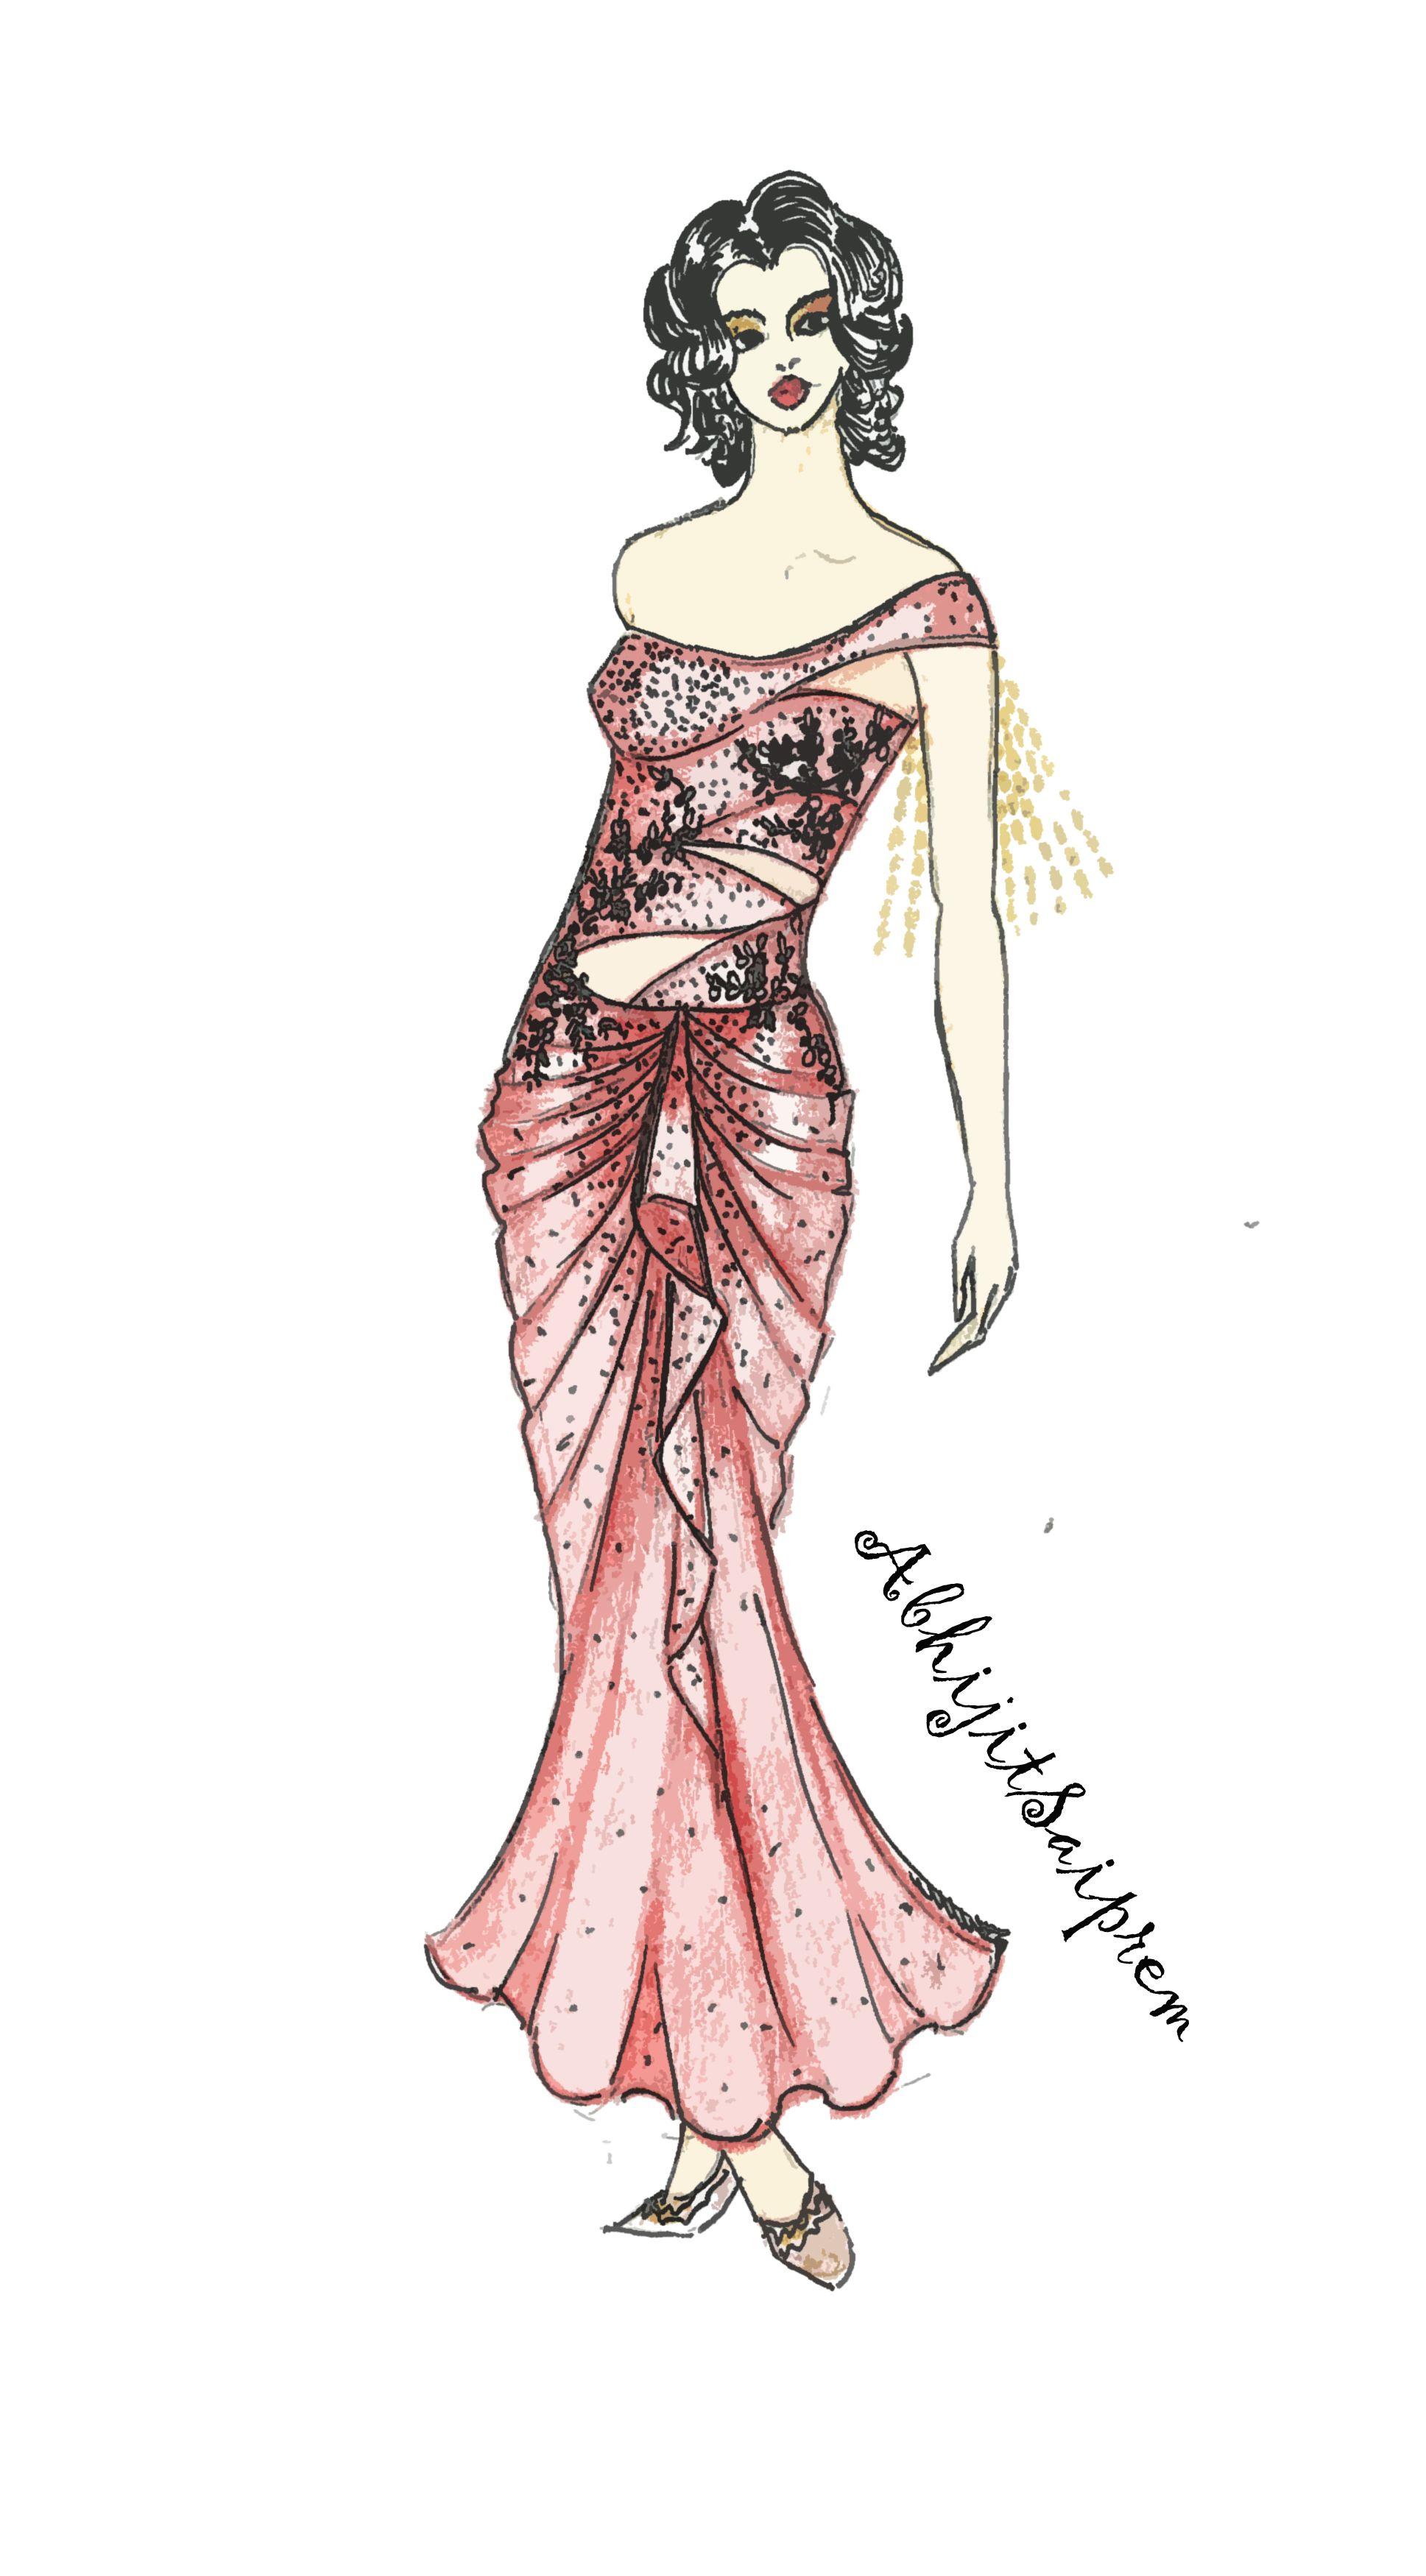 Fashiondesigner Ceo Apparel Textiles Founders Owner Retail Wholesale Garments Exports Humanresource Fashion Company Mumbai Fashion Fashion Figures